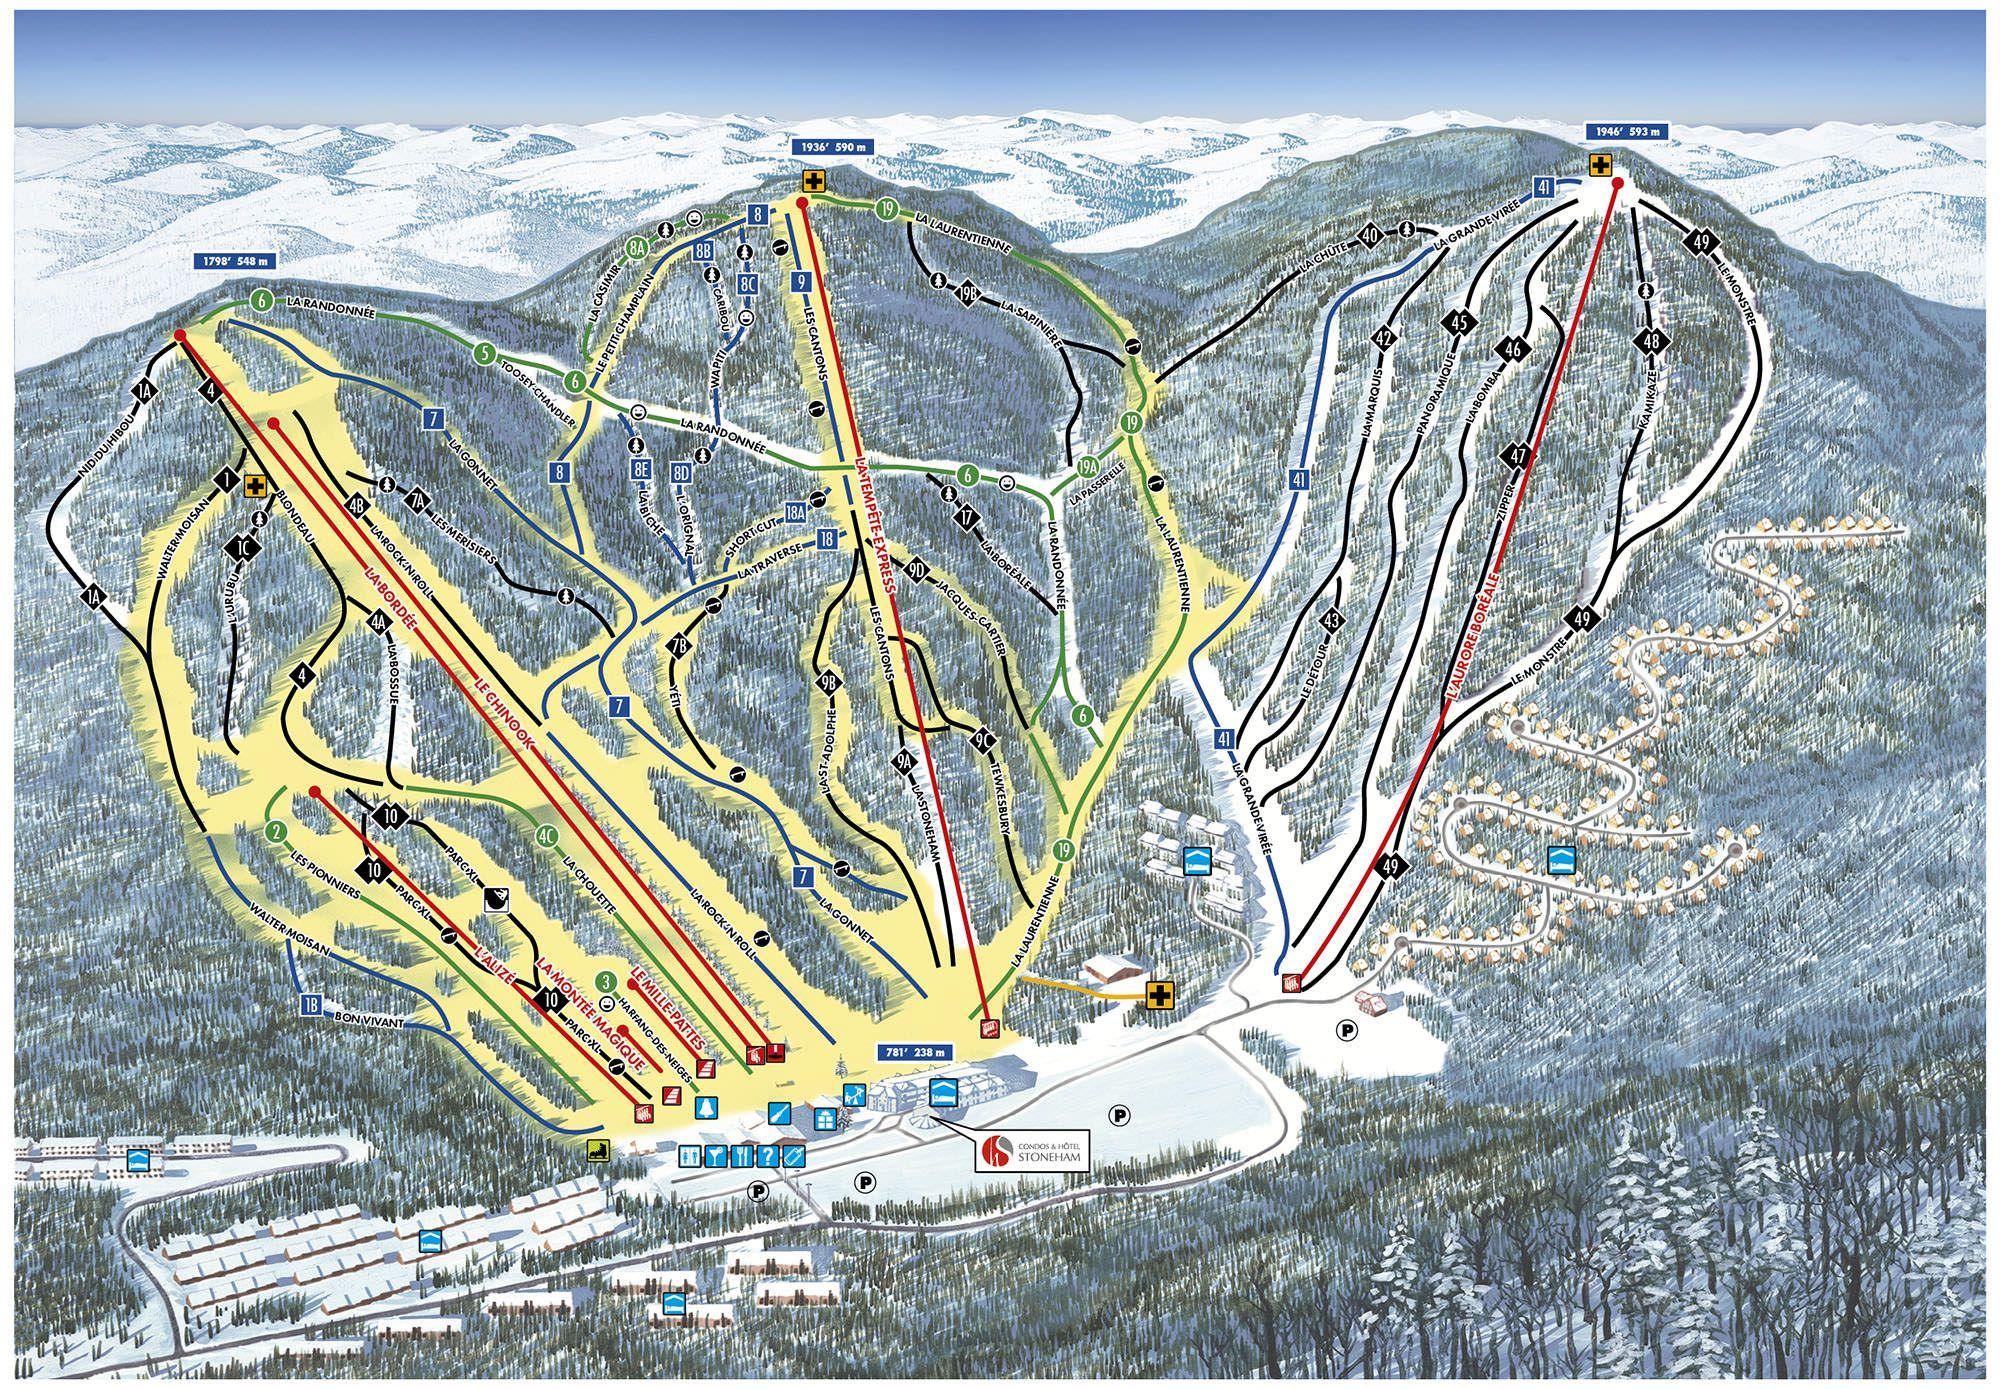 Pin By Debbie Bell On Xmas Ideas Ski Movies Journey Skiing